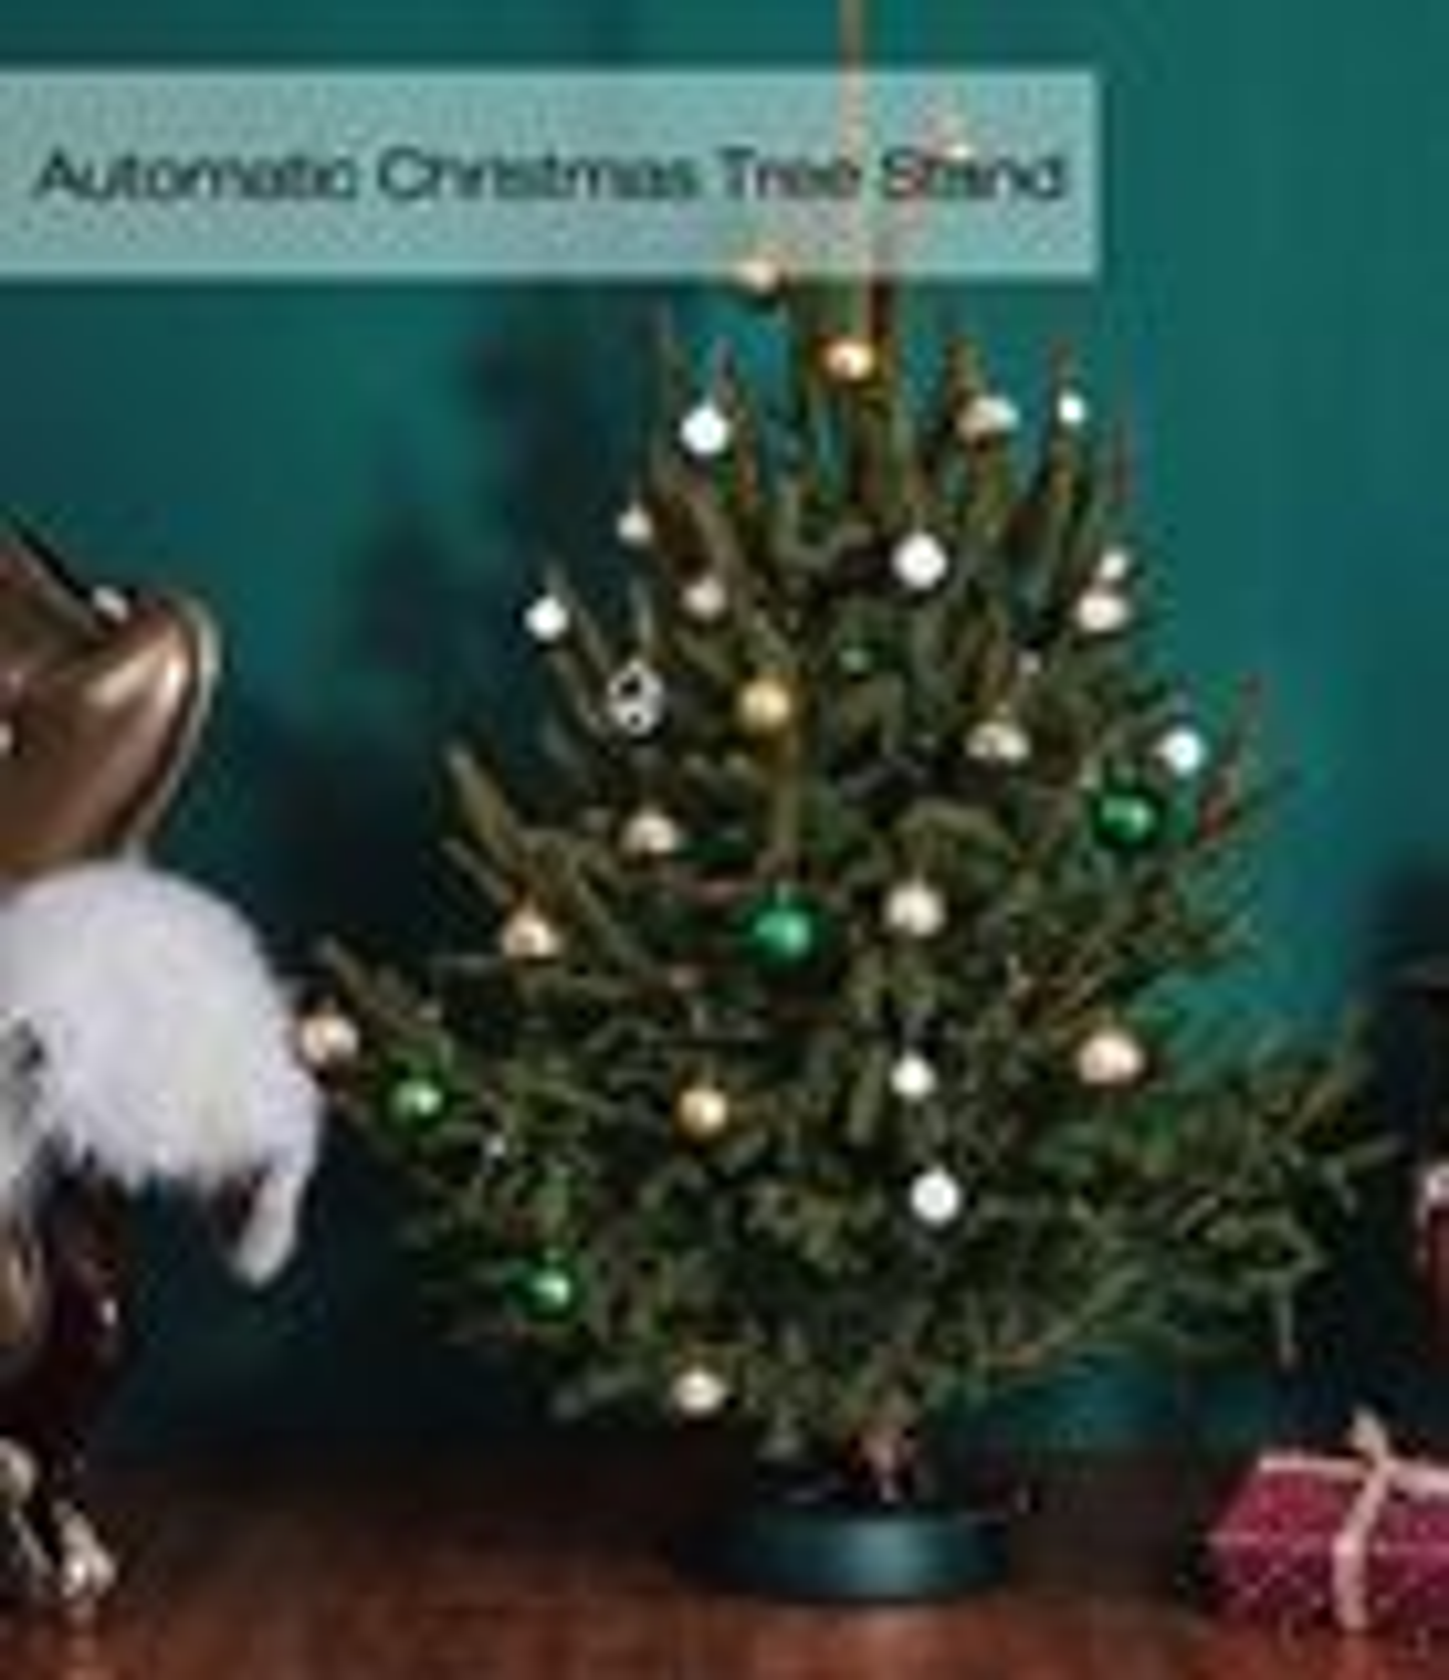 Kerstboomstandaard-easy-grip-M220-voor-kerstbomen-tot-2-2m-hoogte-kerstboomvoet